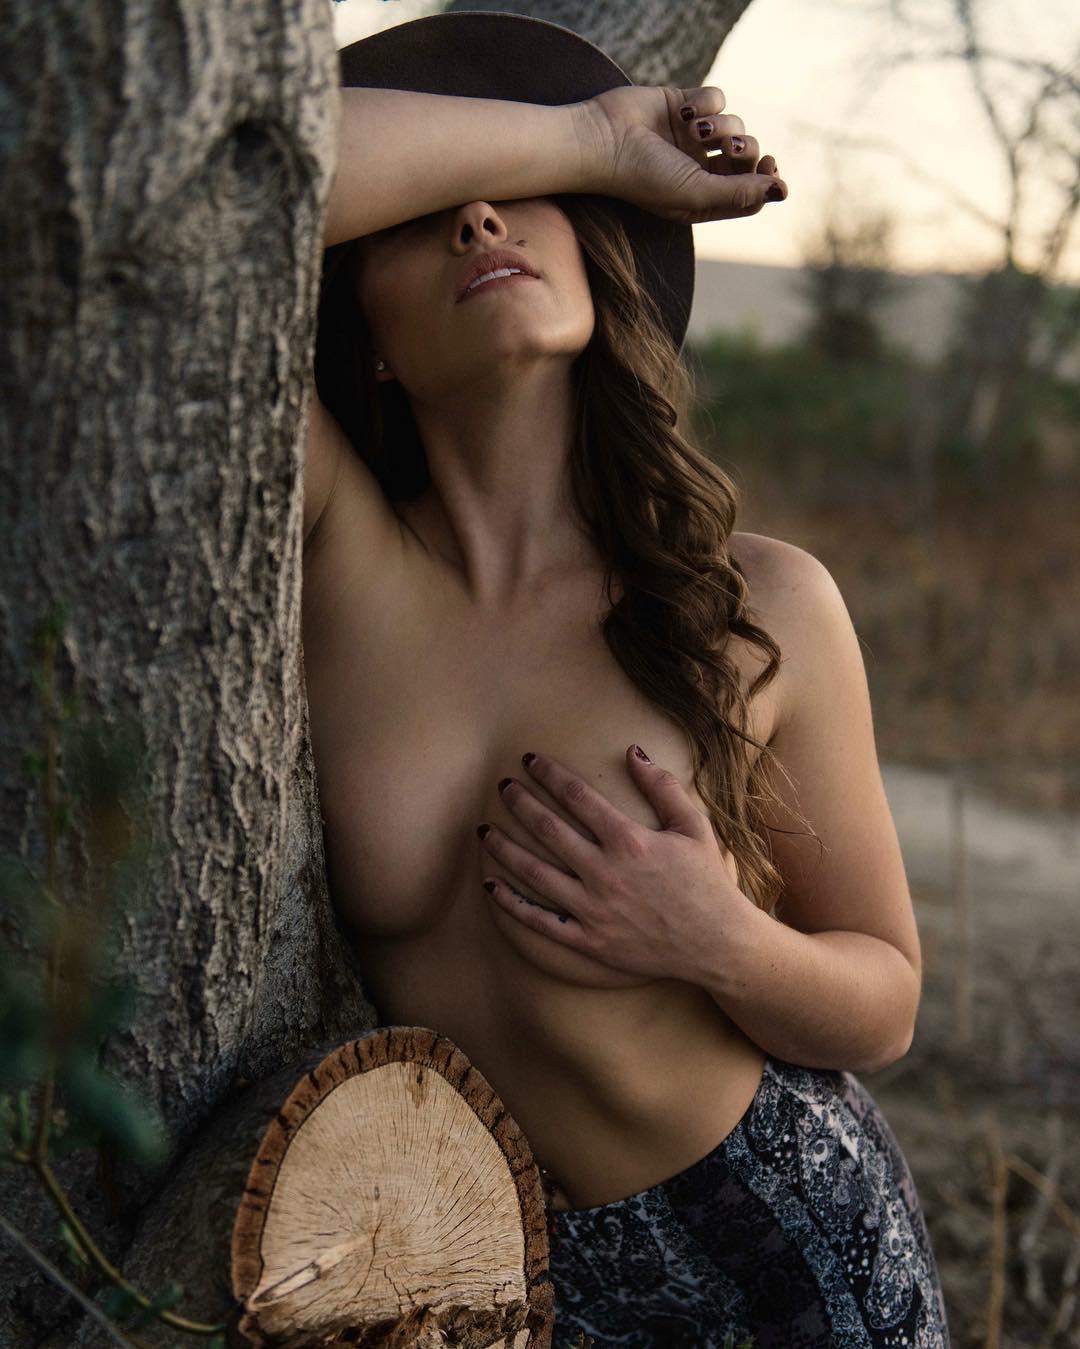 Laurel Witt nude (88 photo), video Sideboobs, Twitter, butt 2016